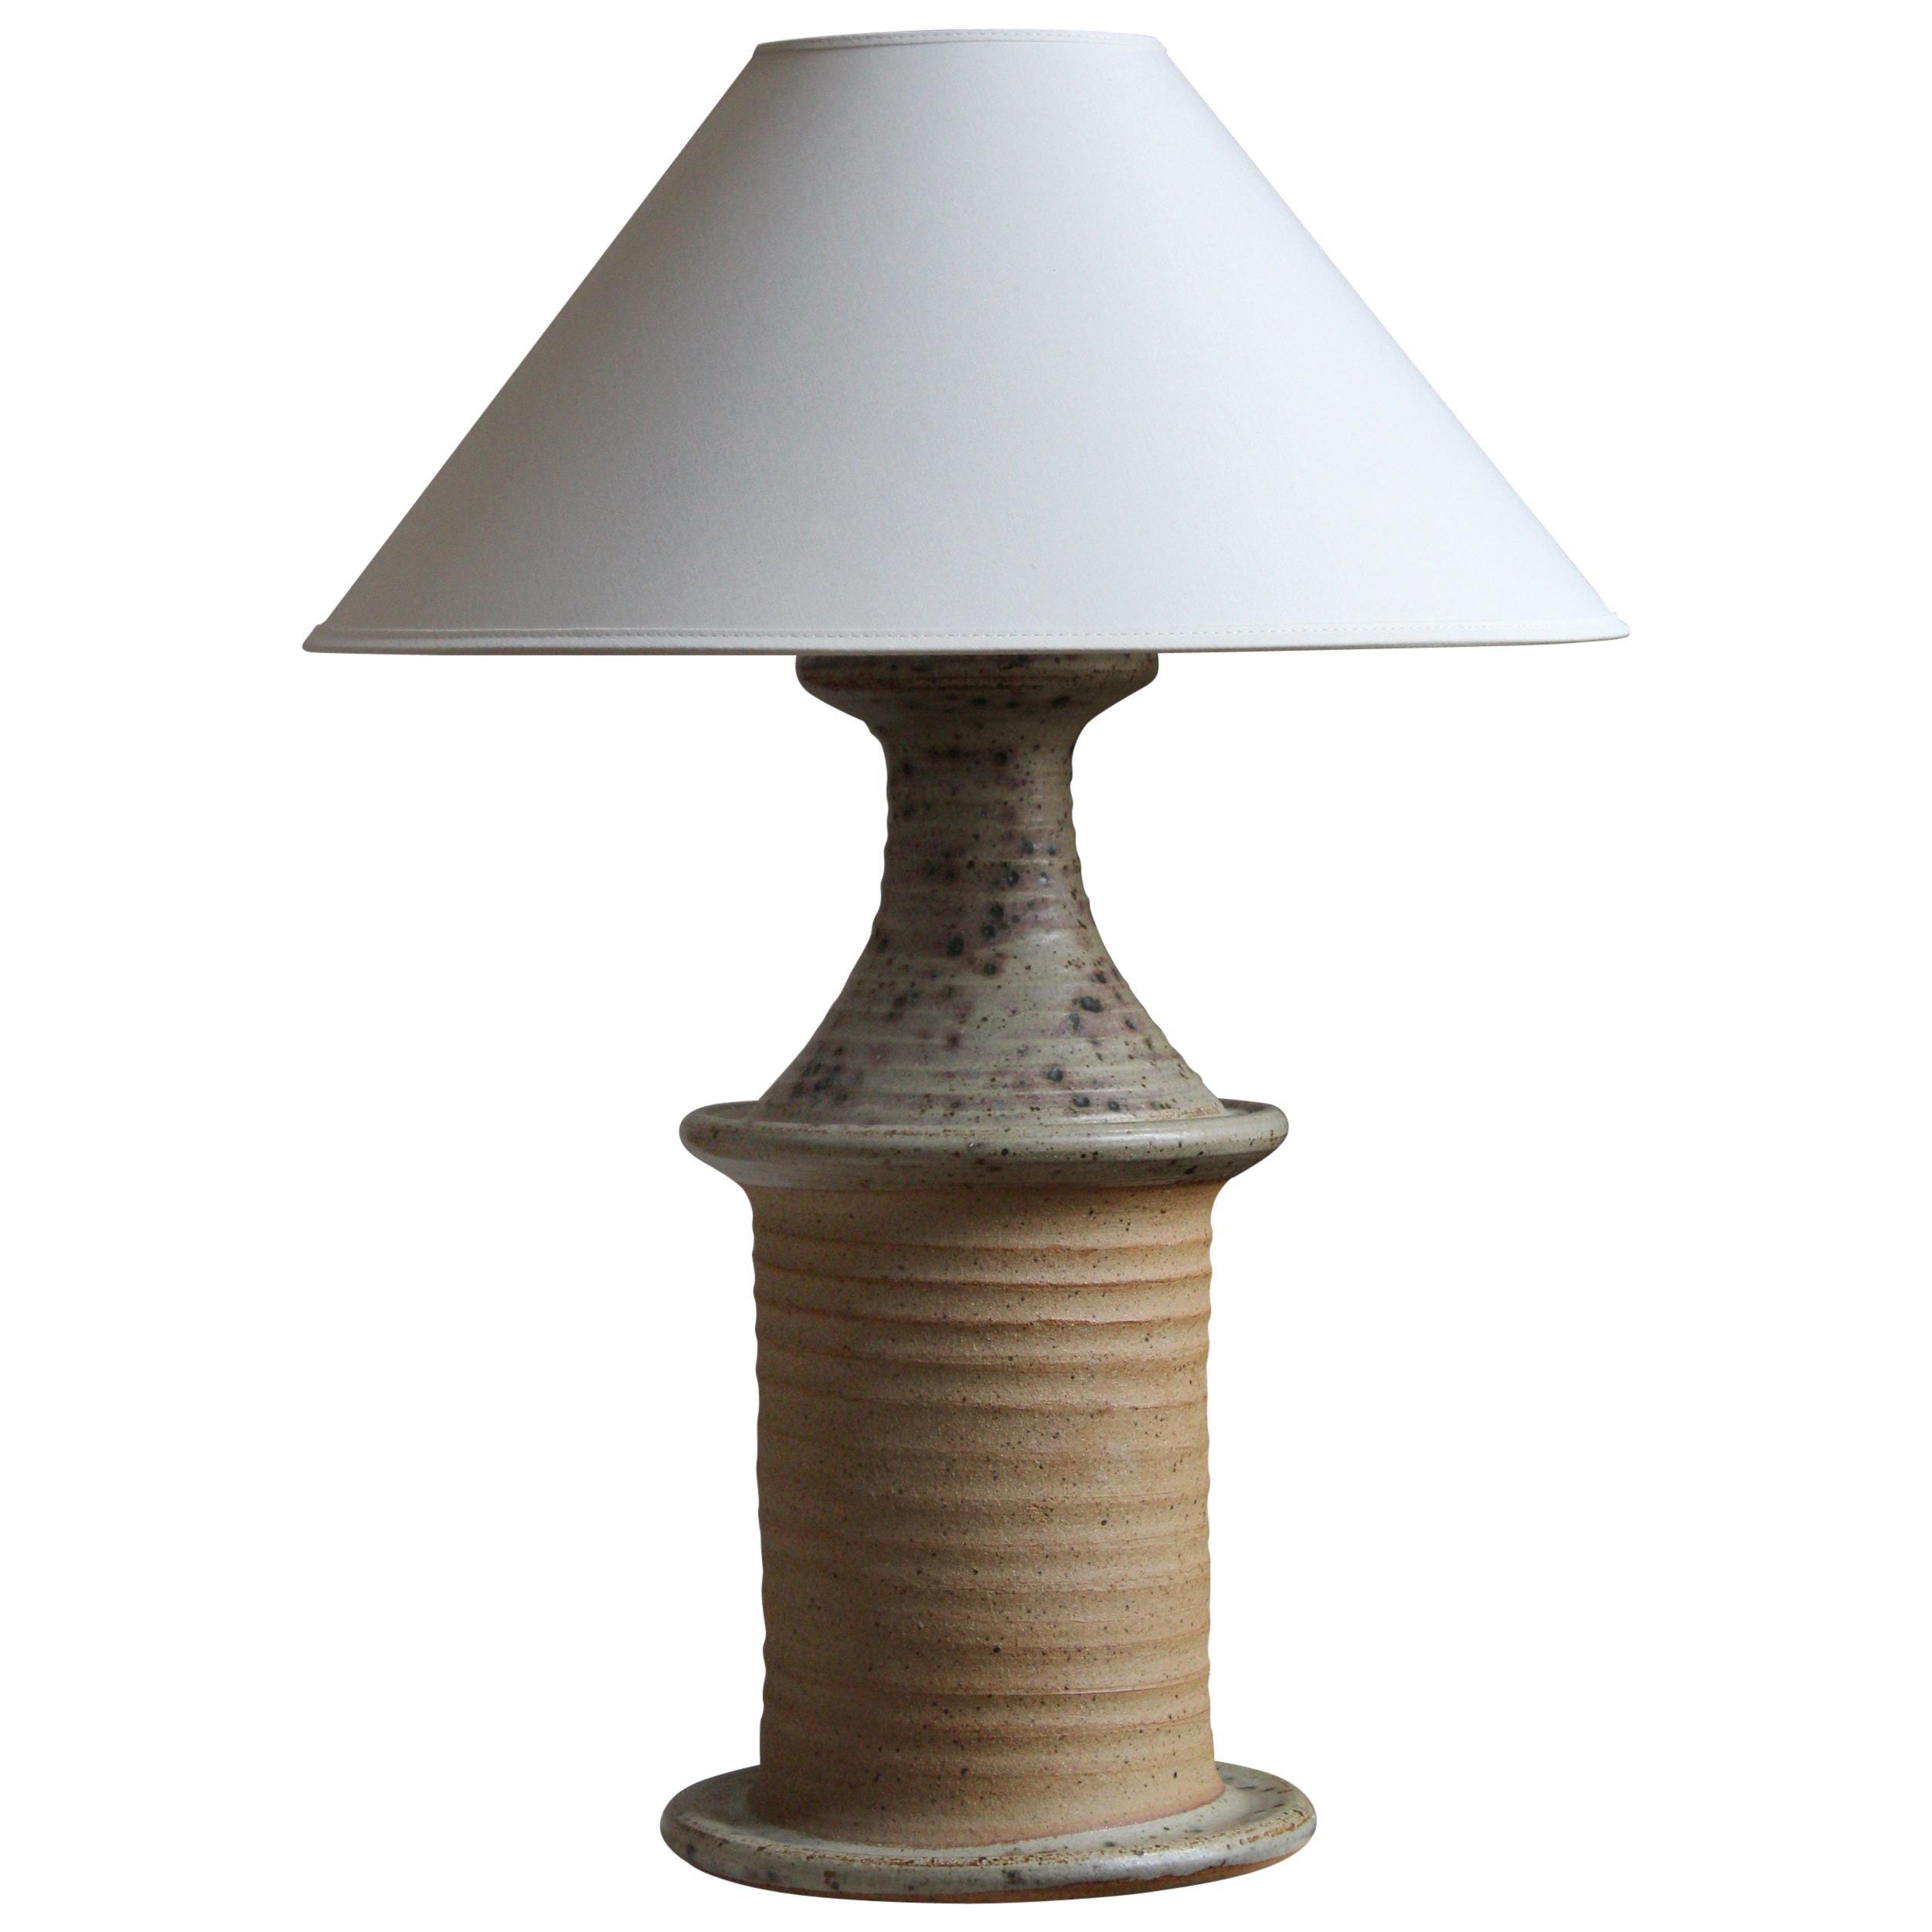 Tue Poulsen, Sizable Table Lamp, Glazed Stoneware, Denmark, 1960s